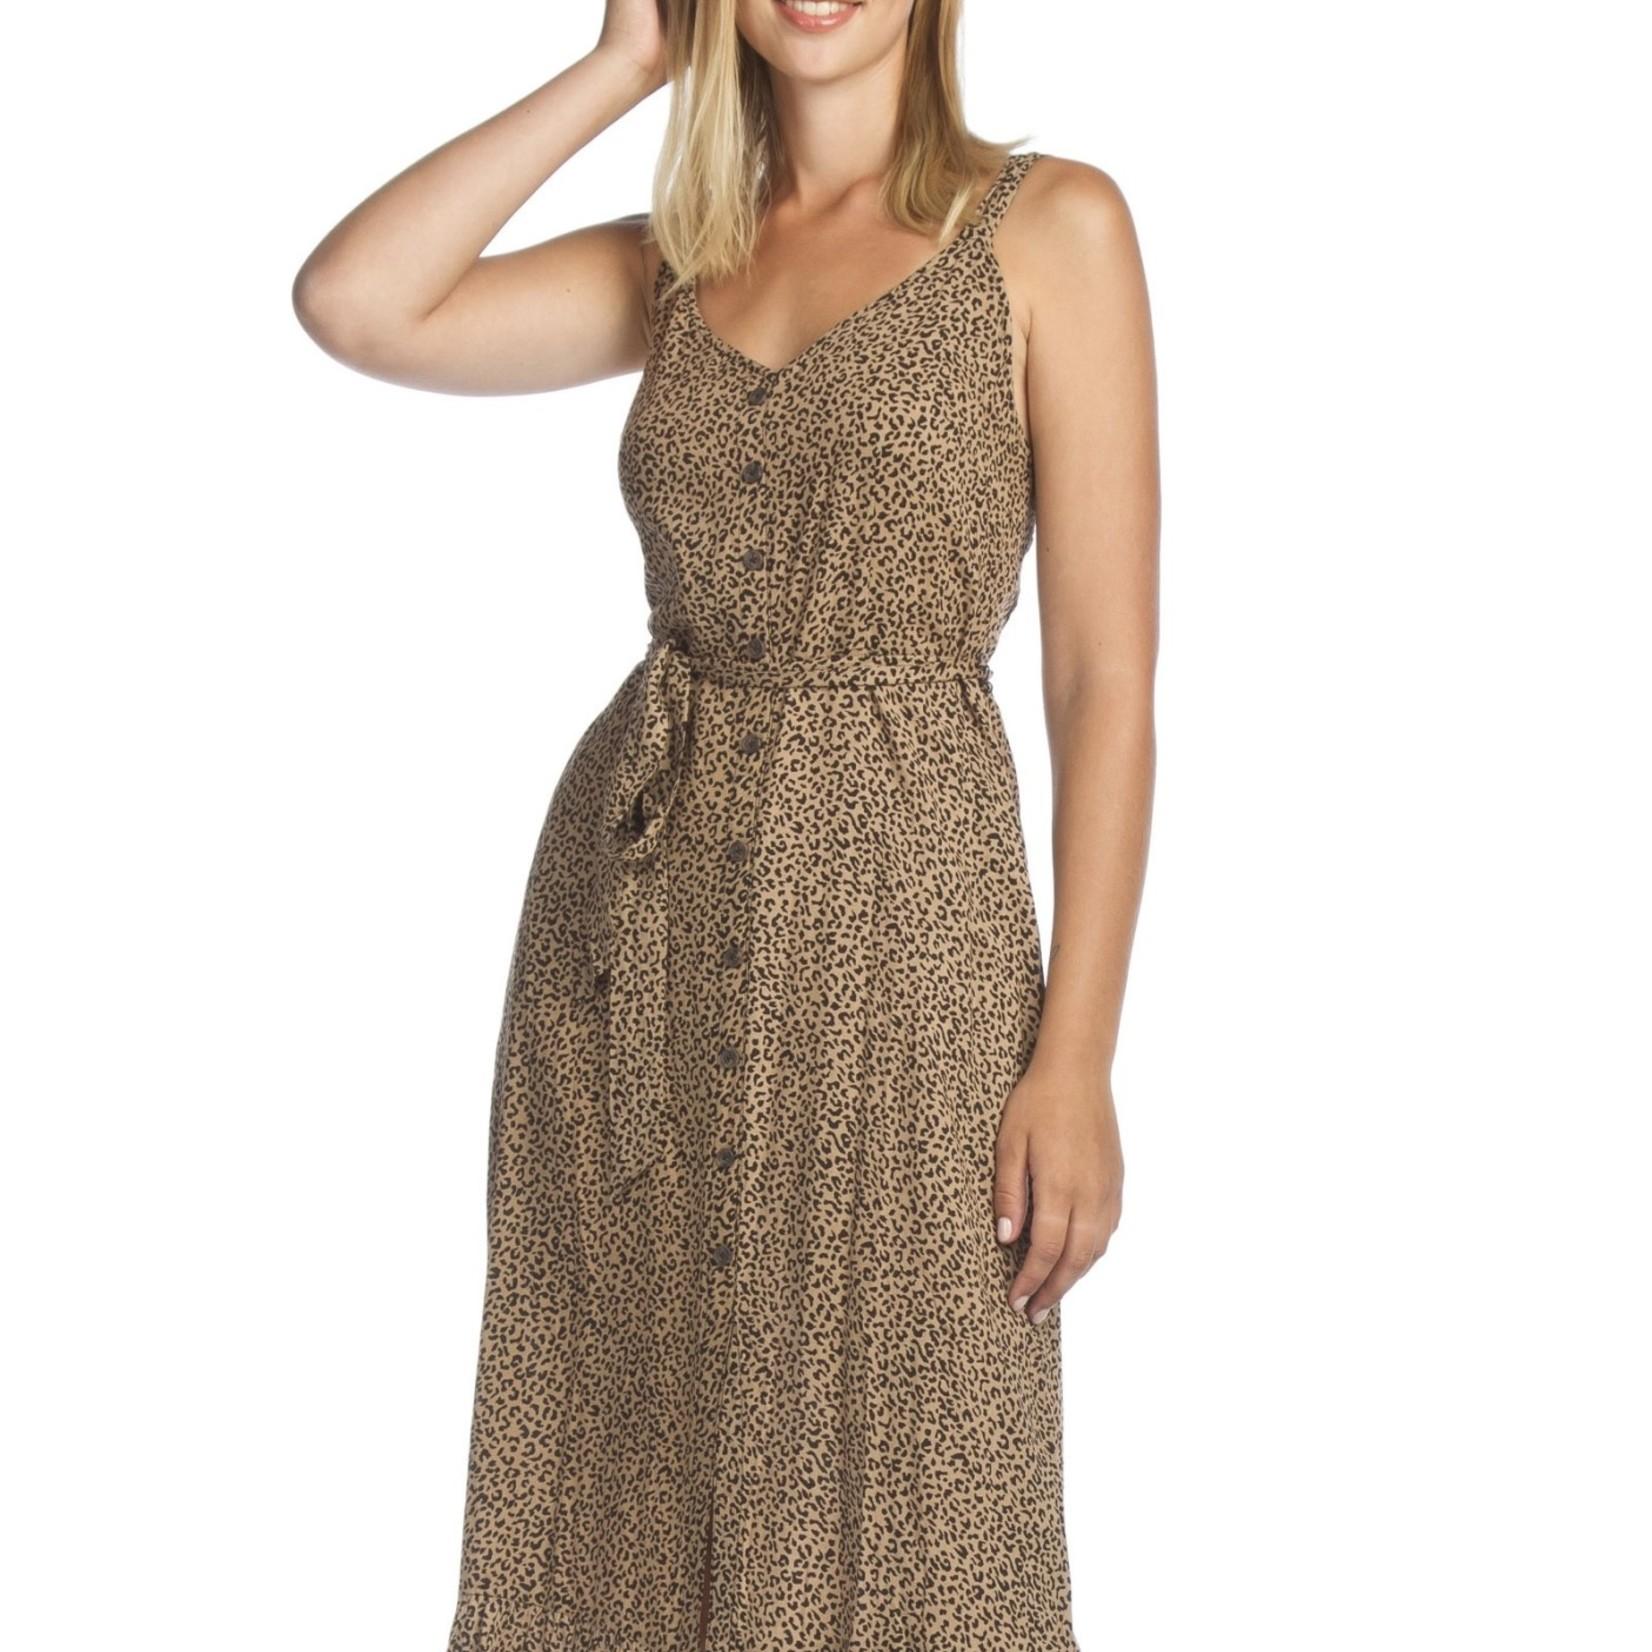 Papillon Leopard Print Dress  PD-07560